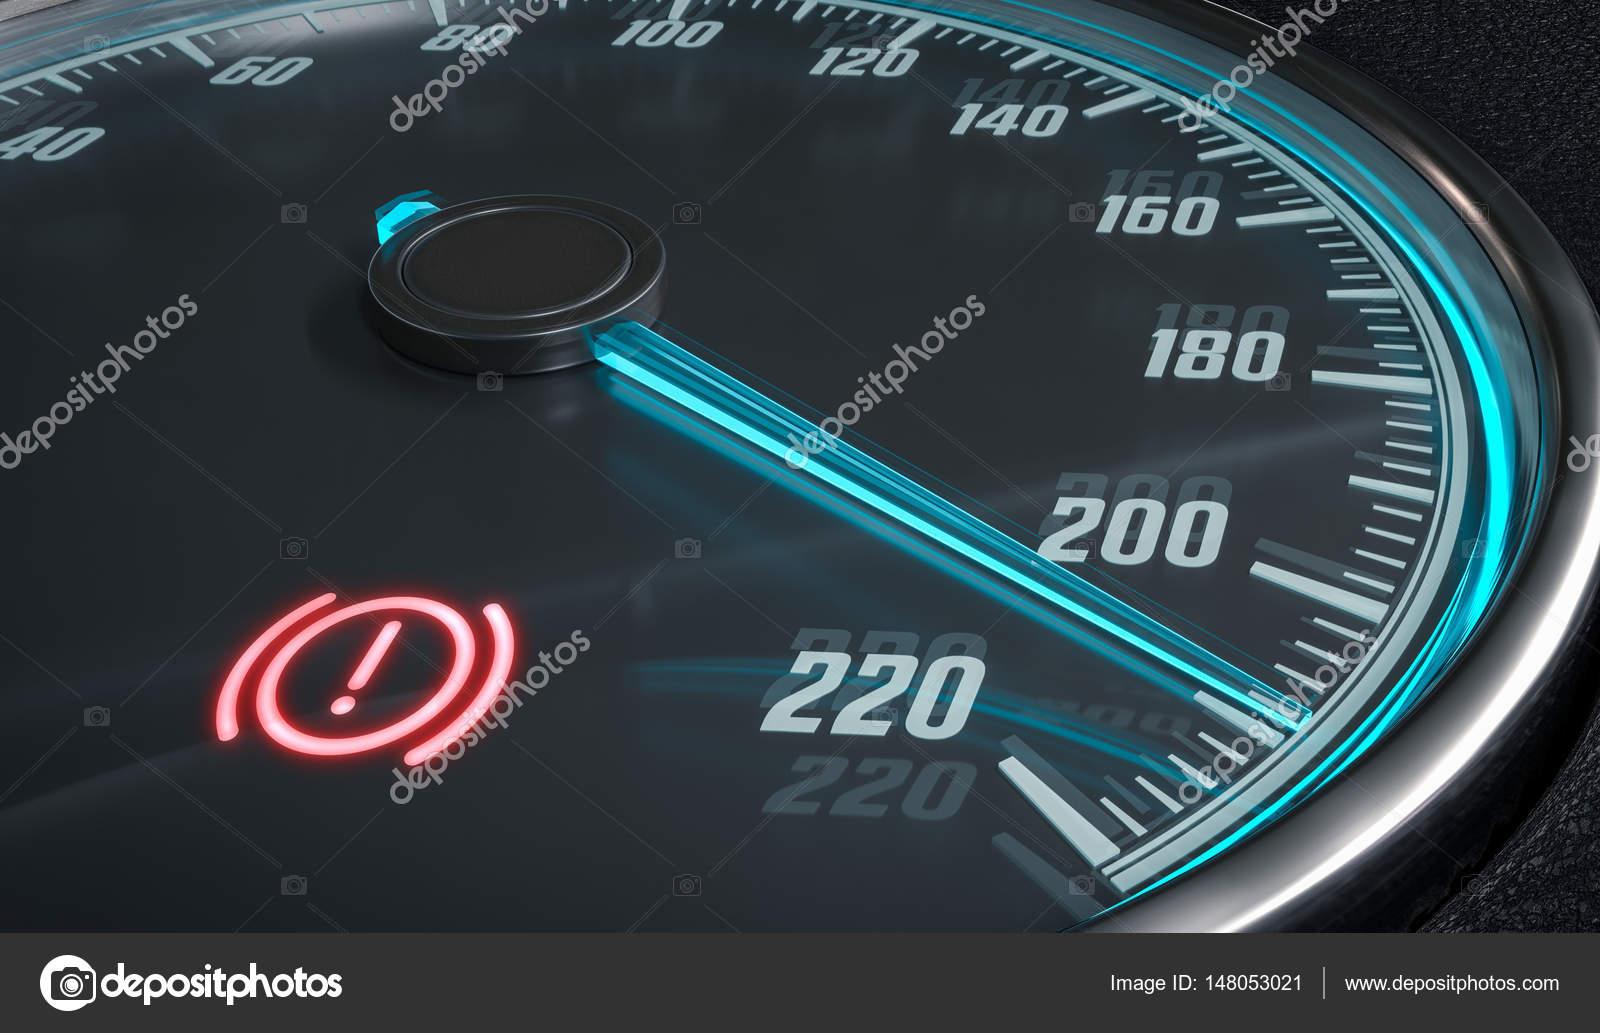 Brake system warning light in car dashboard  3D rendered